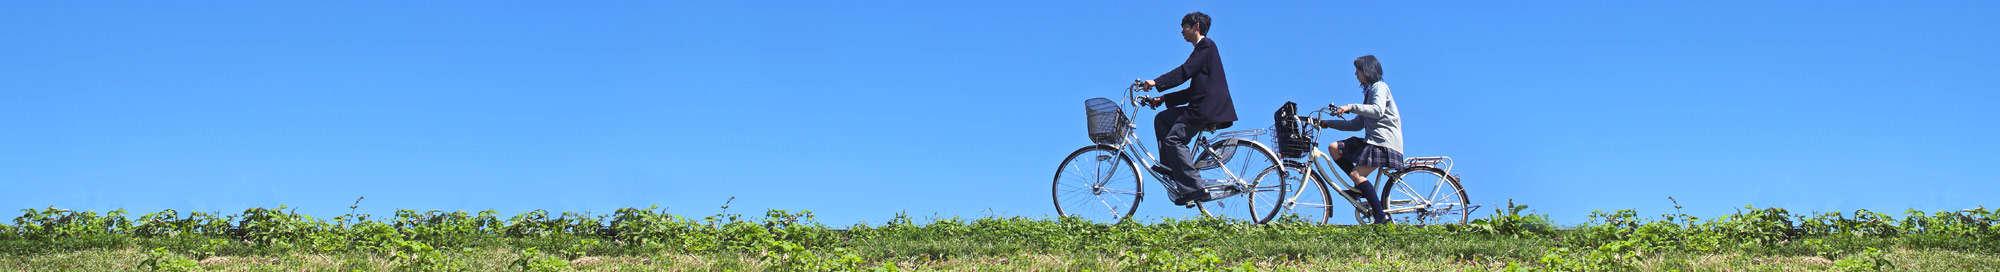 Escapadas fin de semana En bici en Extremadura